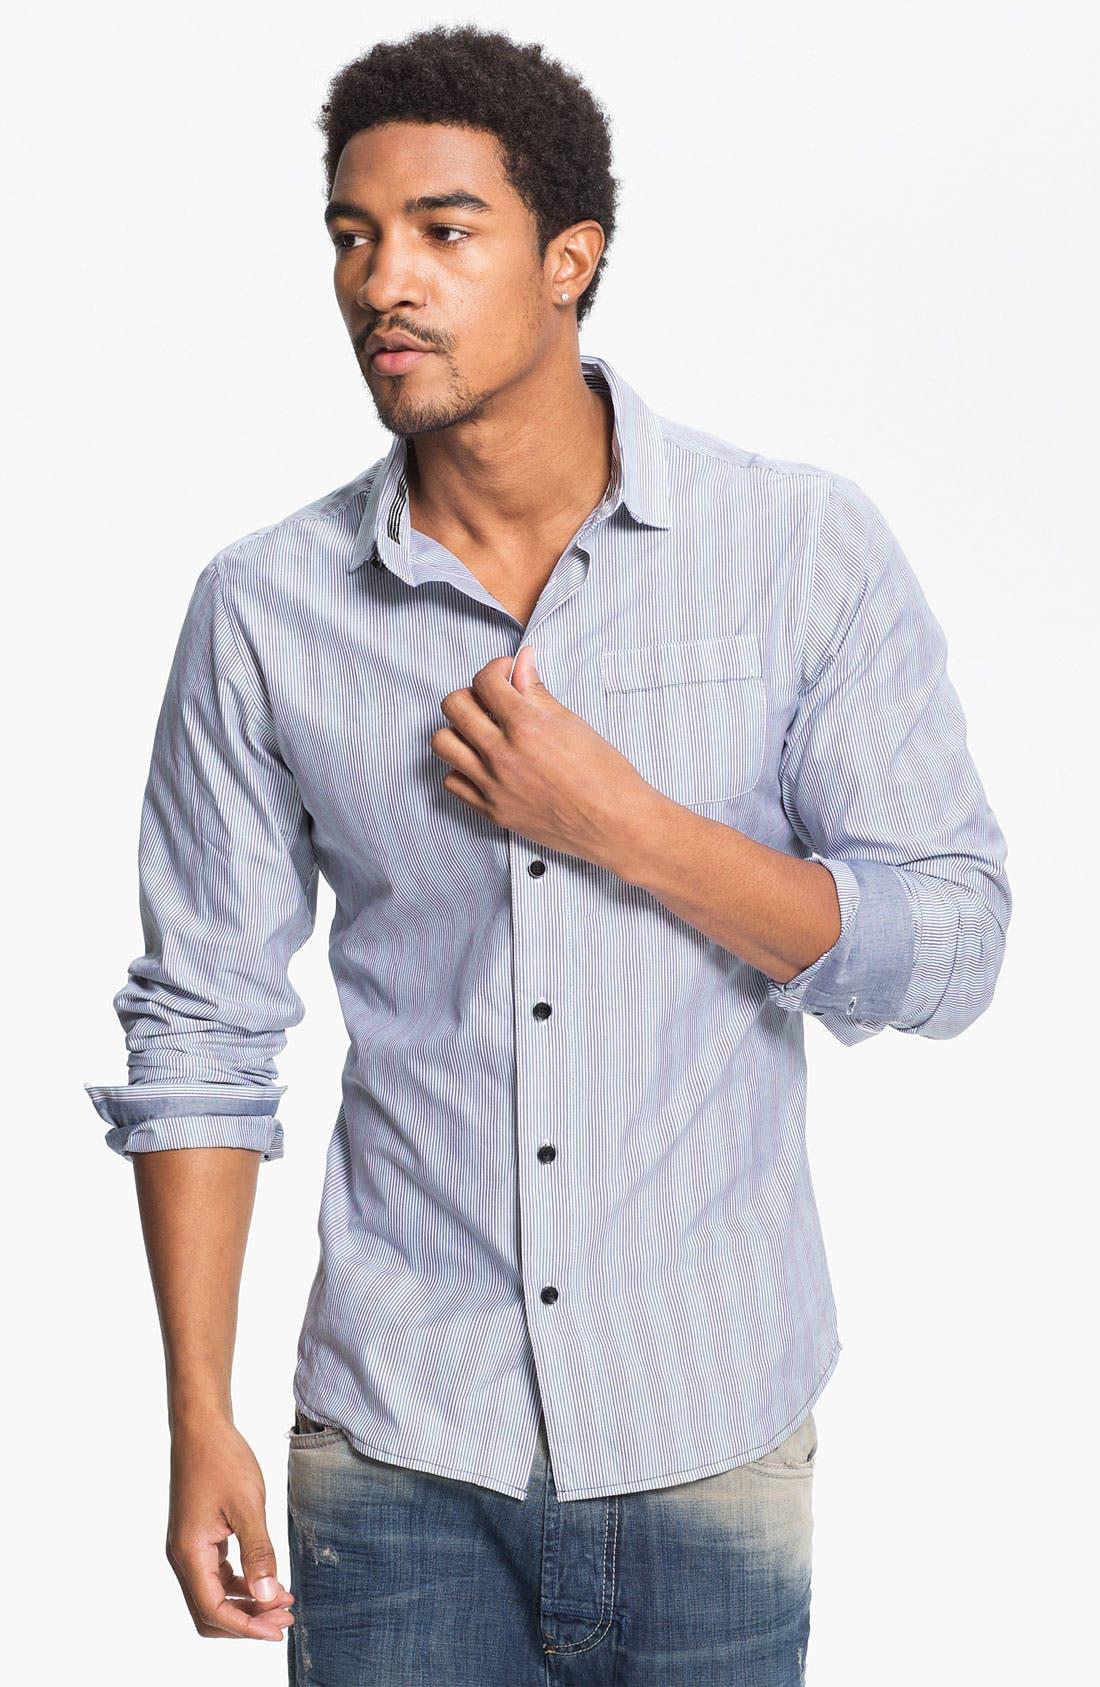 Alternate Image 1 Selected - Descendant of Thieves Multi Stripe Woven Shirt